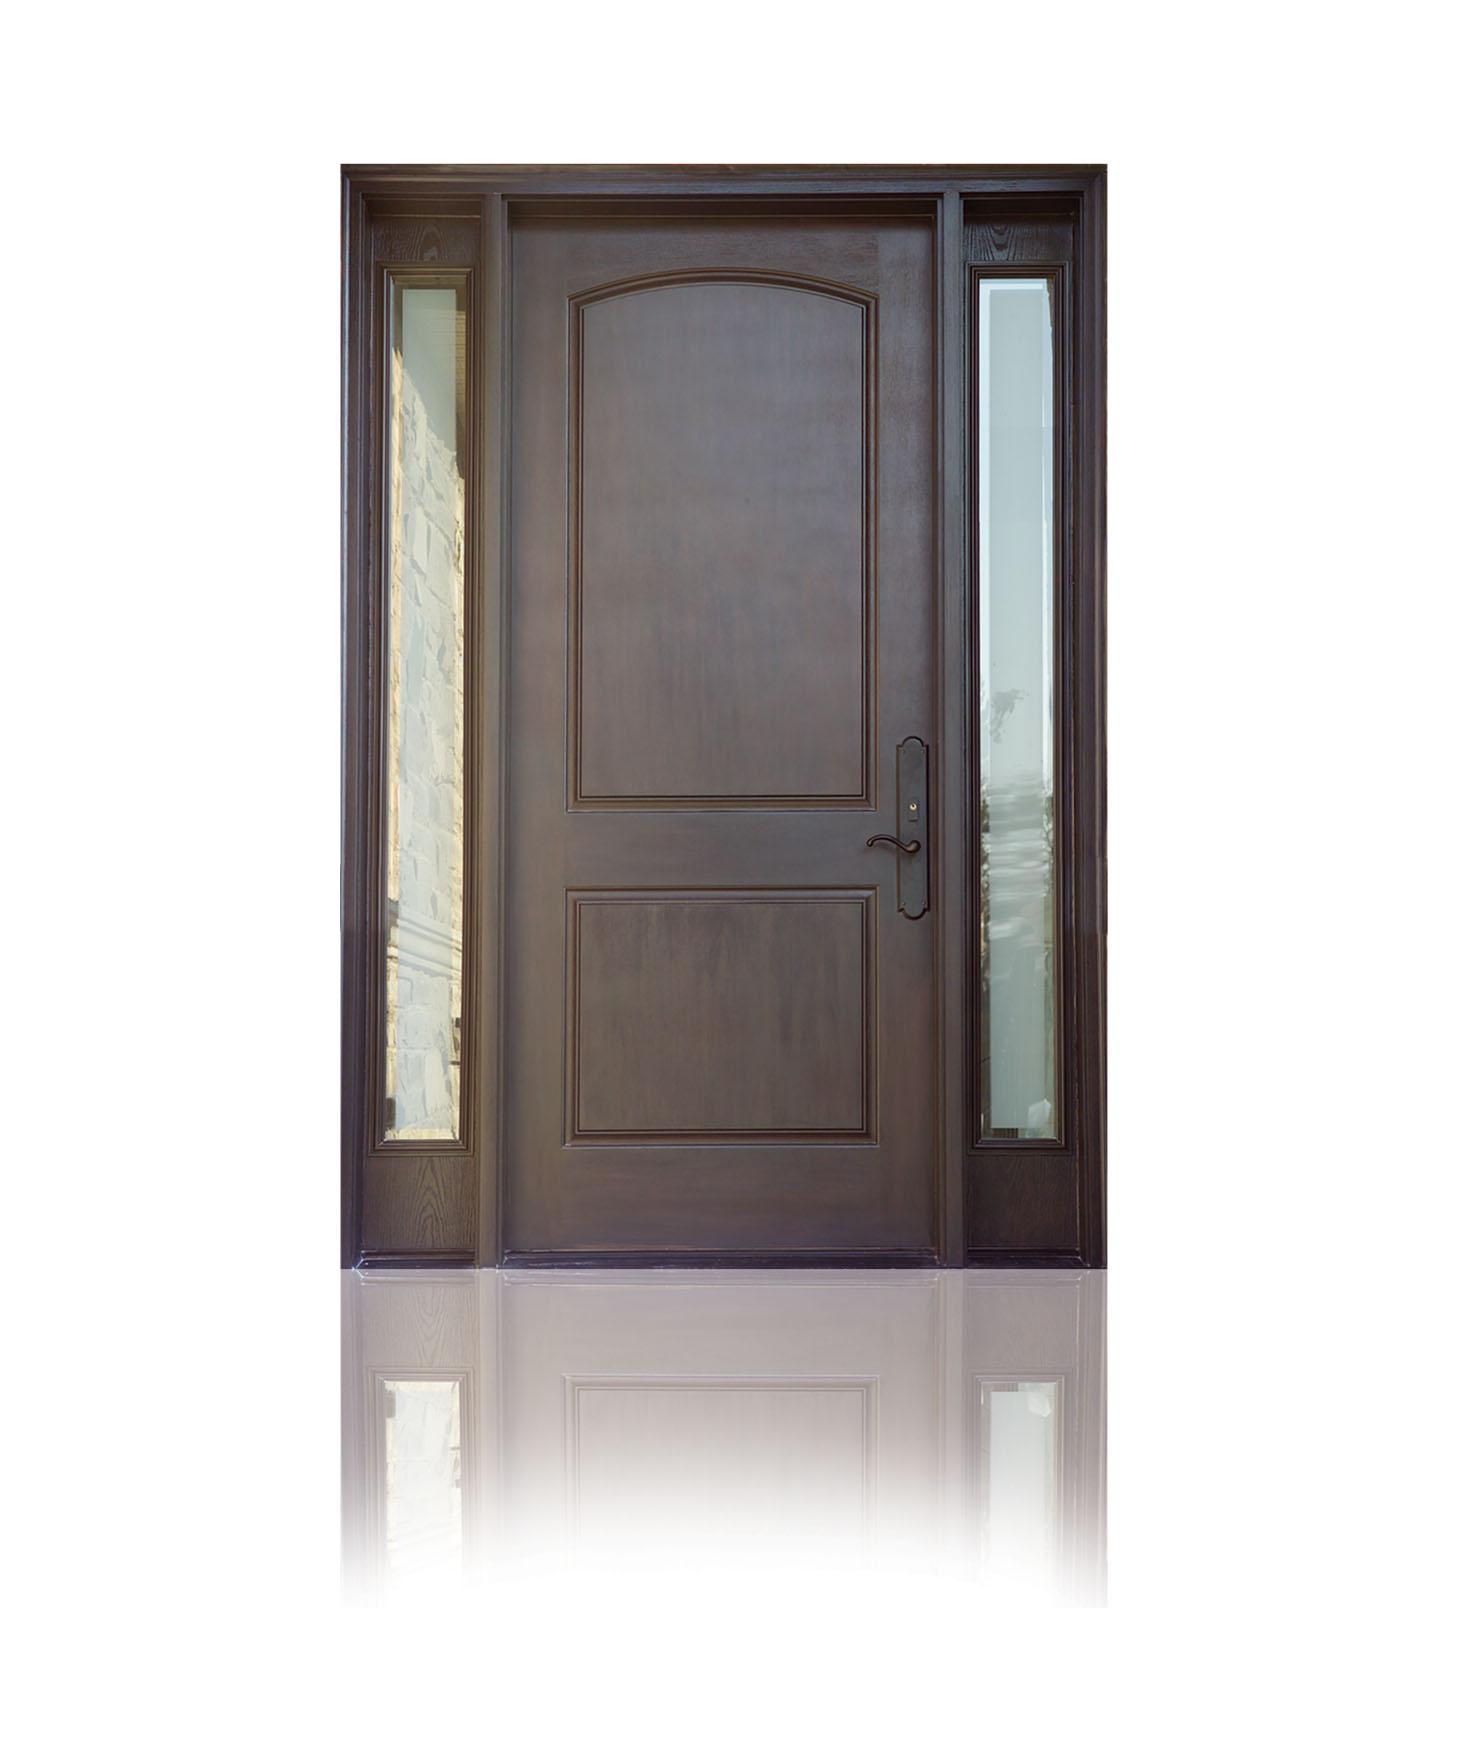 https://unitechdoors.com/wp-content/uploads/2018/07/Minett-Series_0003_Layer-2.jpg